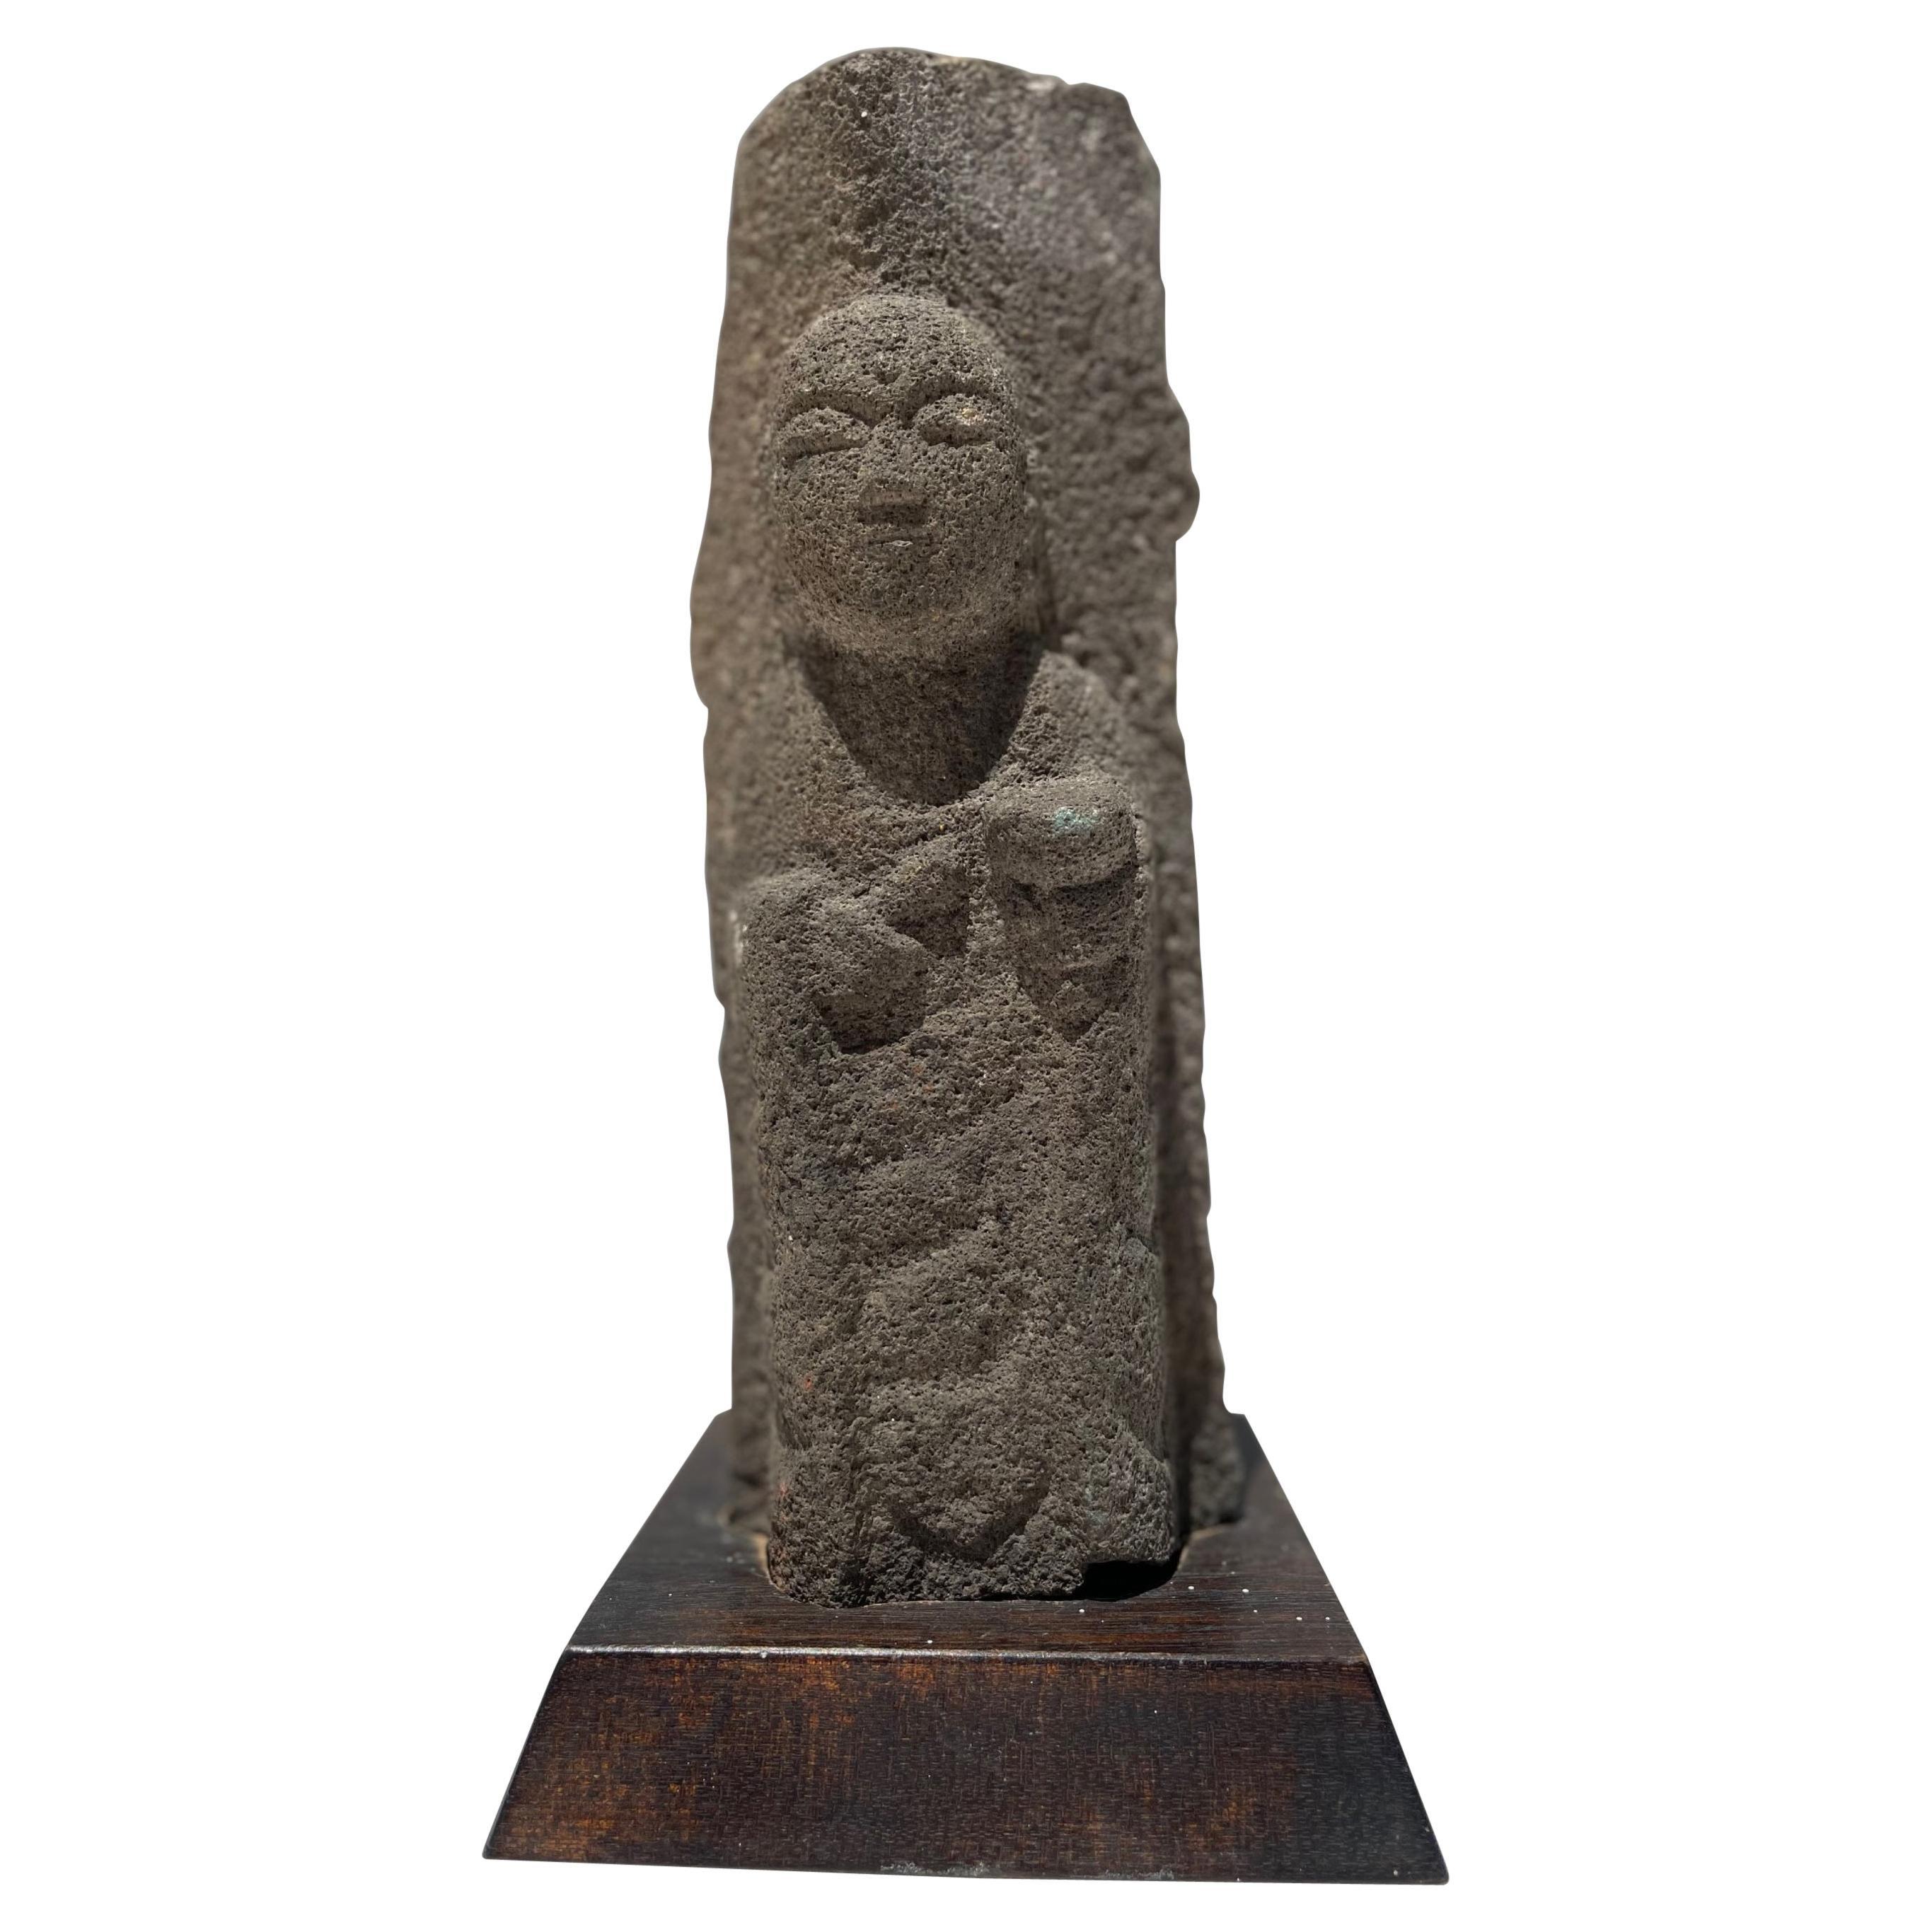 # 1, 18th Century Japanese Jizo Bodhisattva Stone Carving